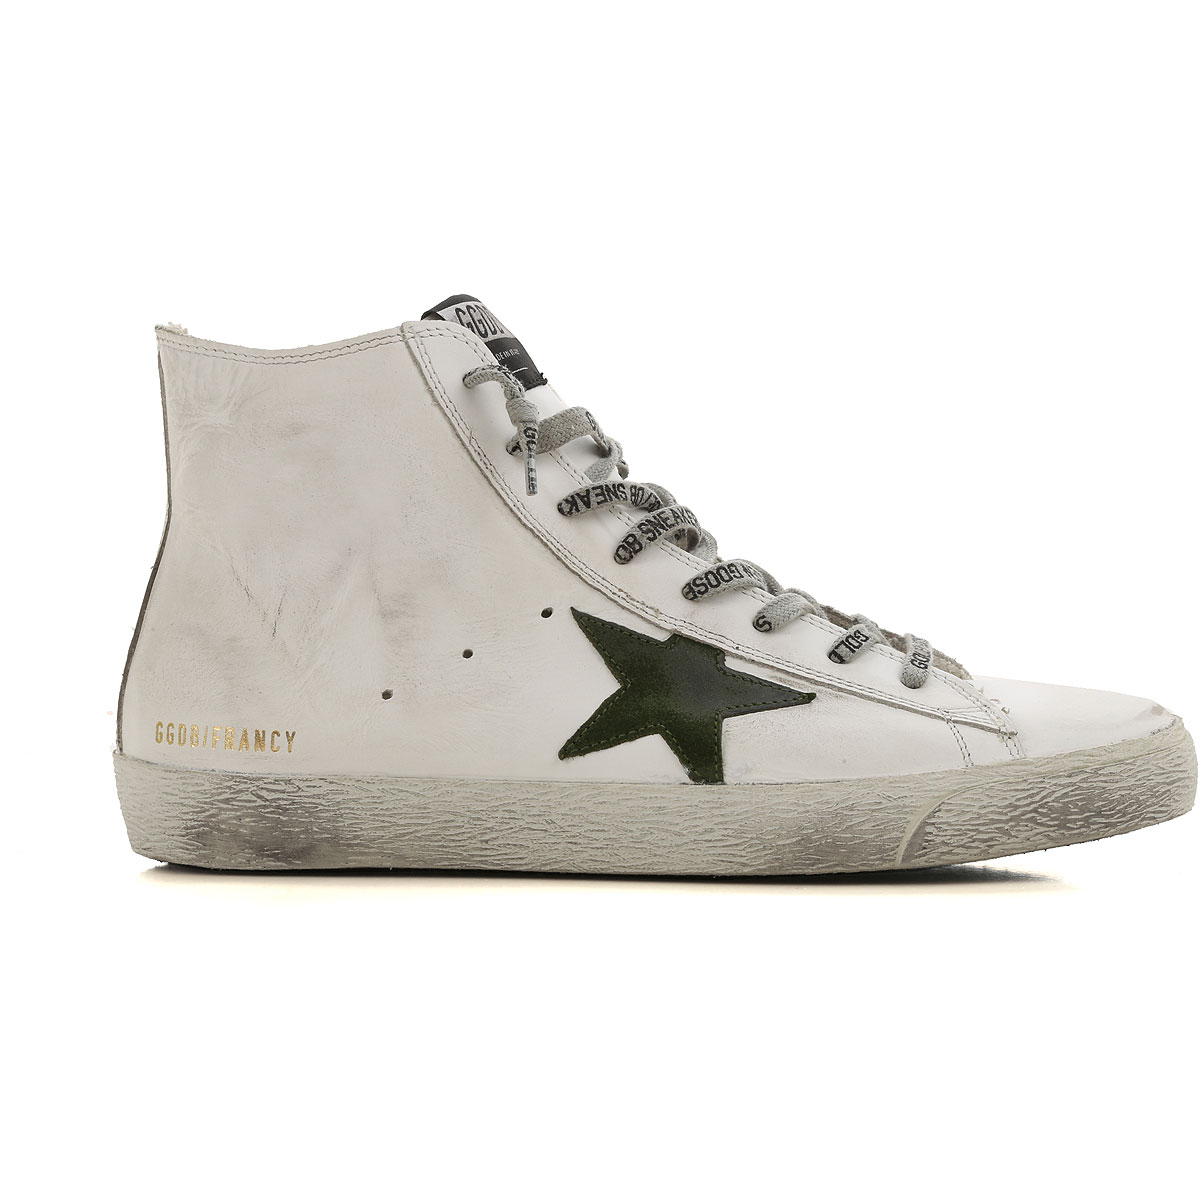 Scarpe Uomo Sneakers Golden Goose Offerte Limitate